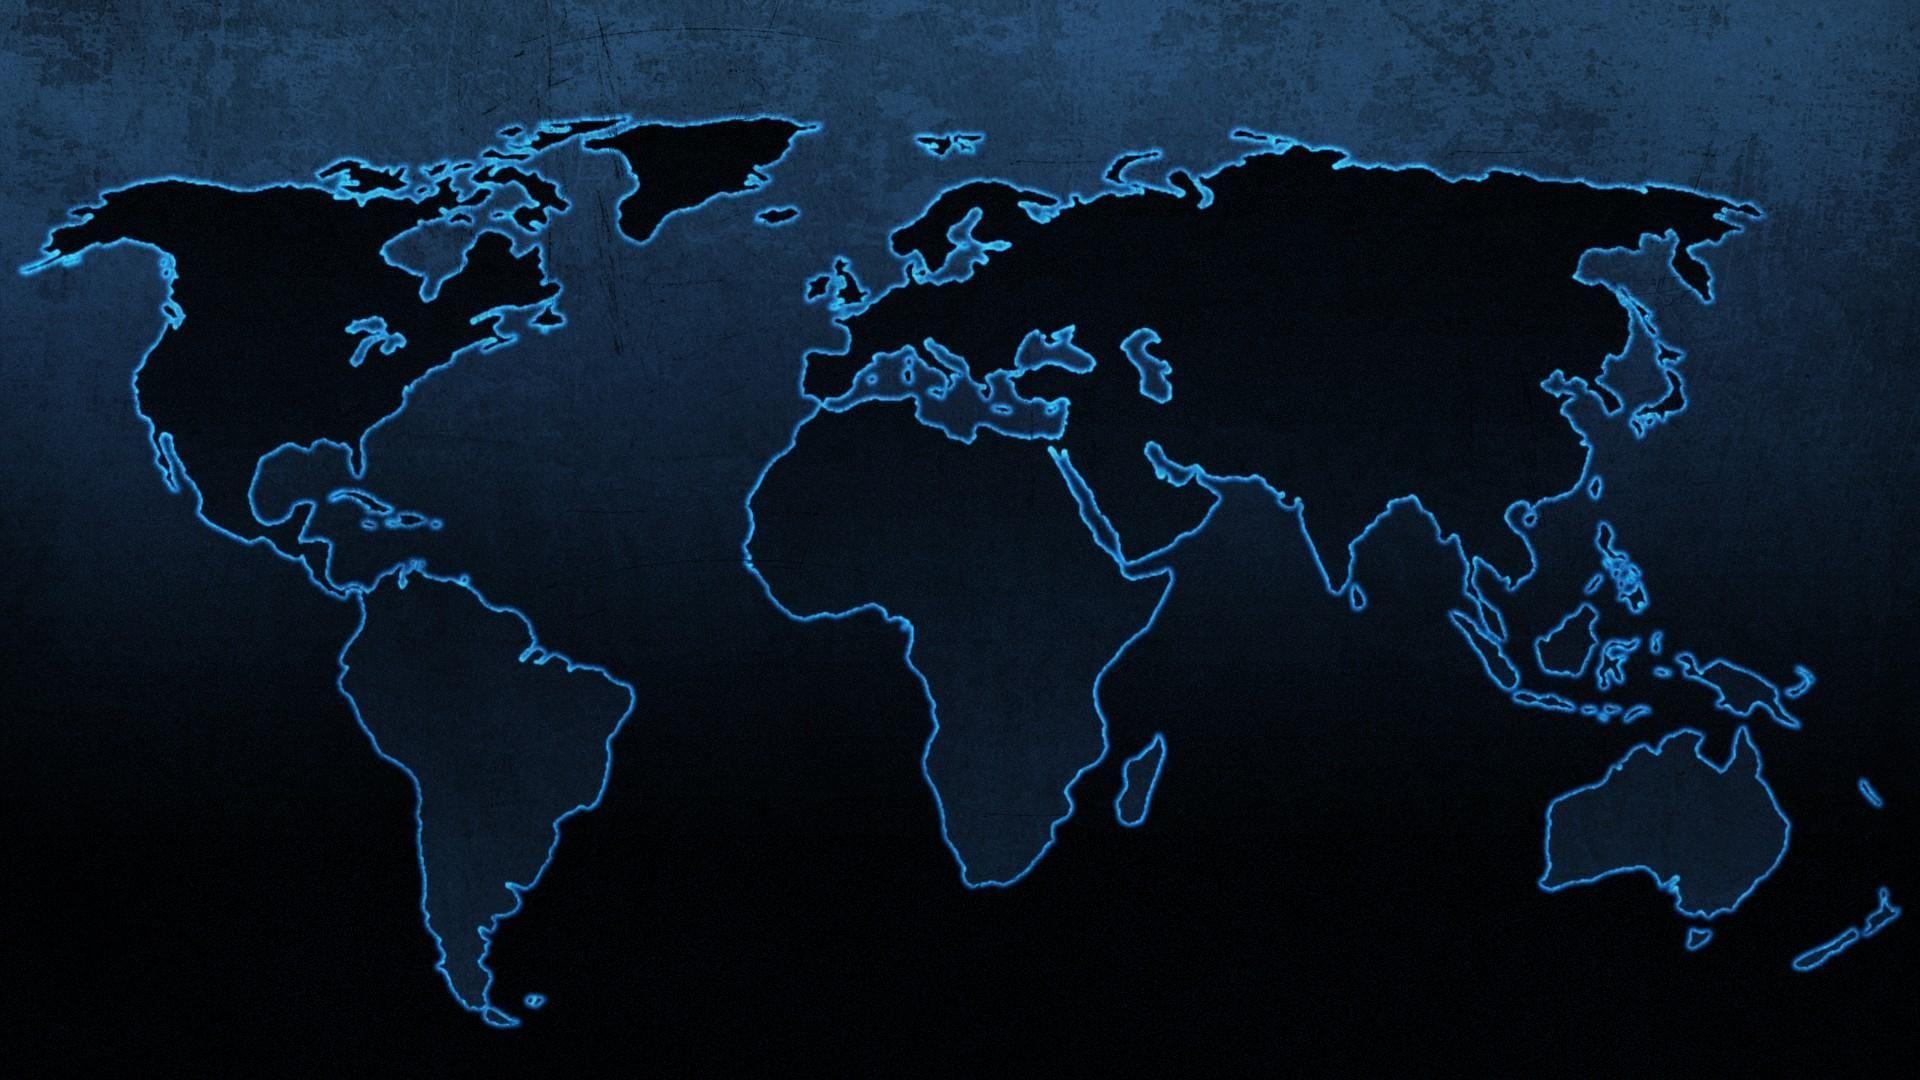 Continent Desktop Wallpapers Top Free Continent Desktop